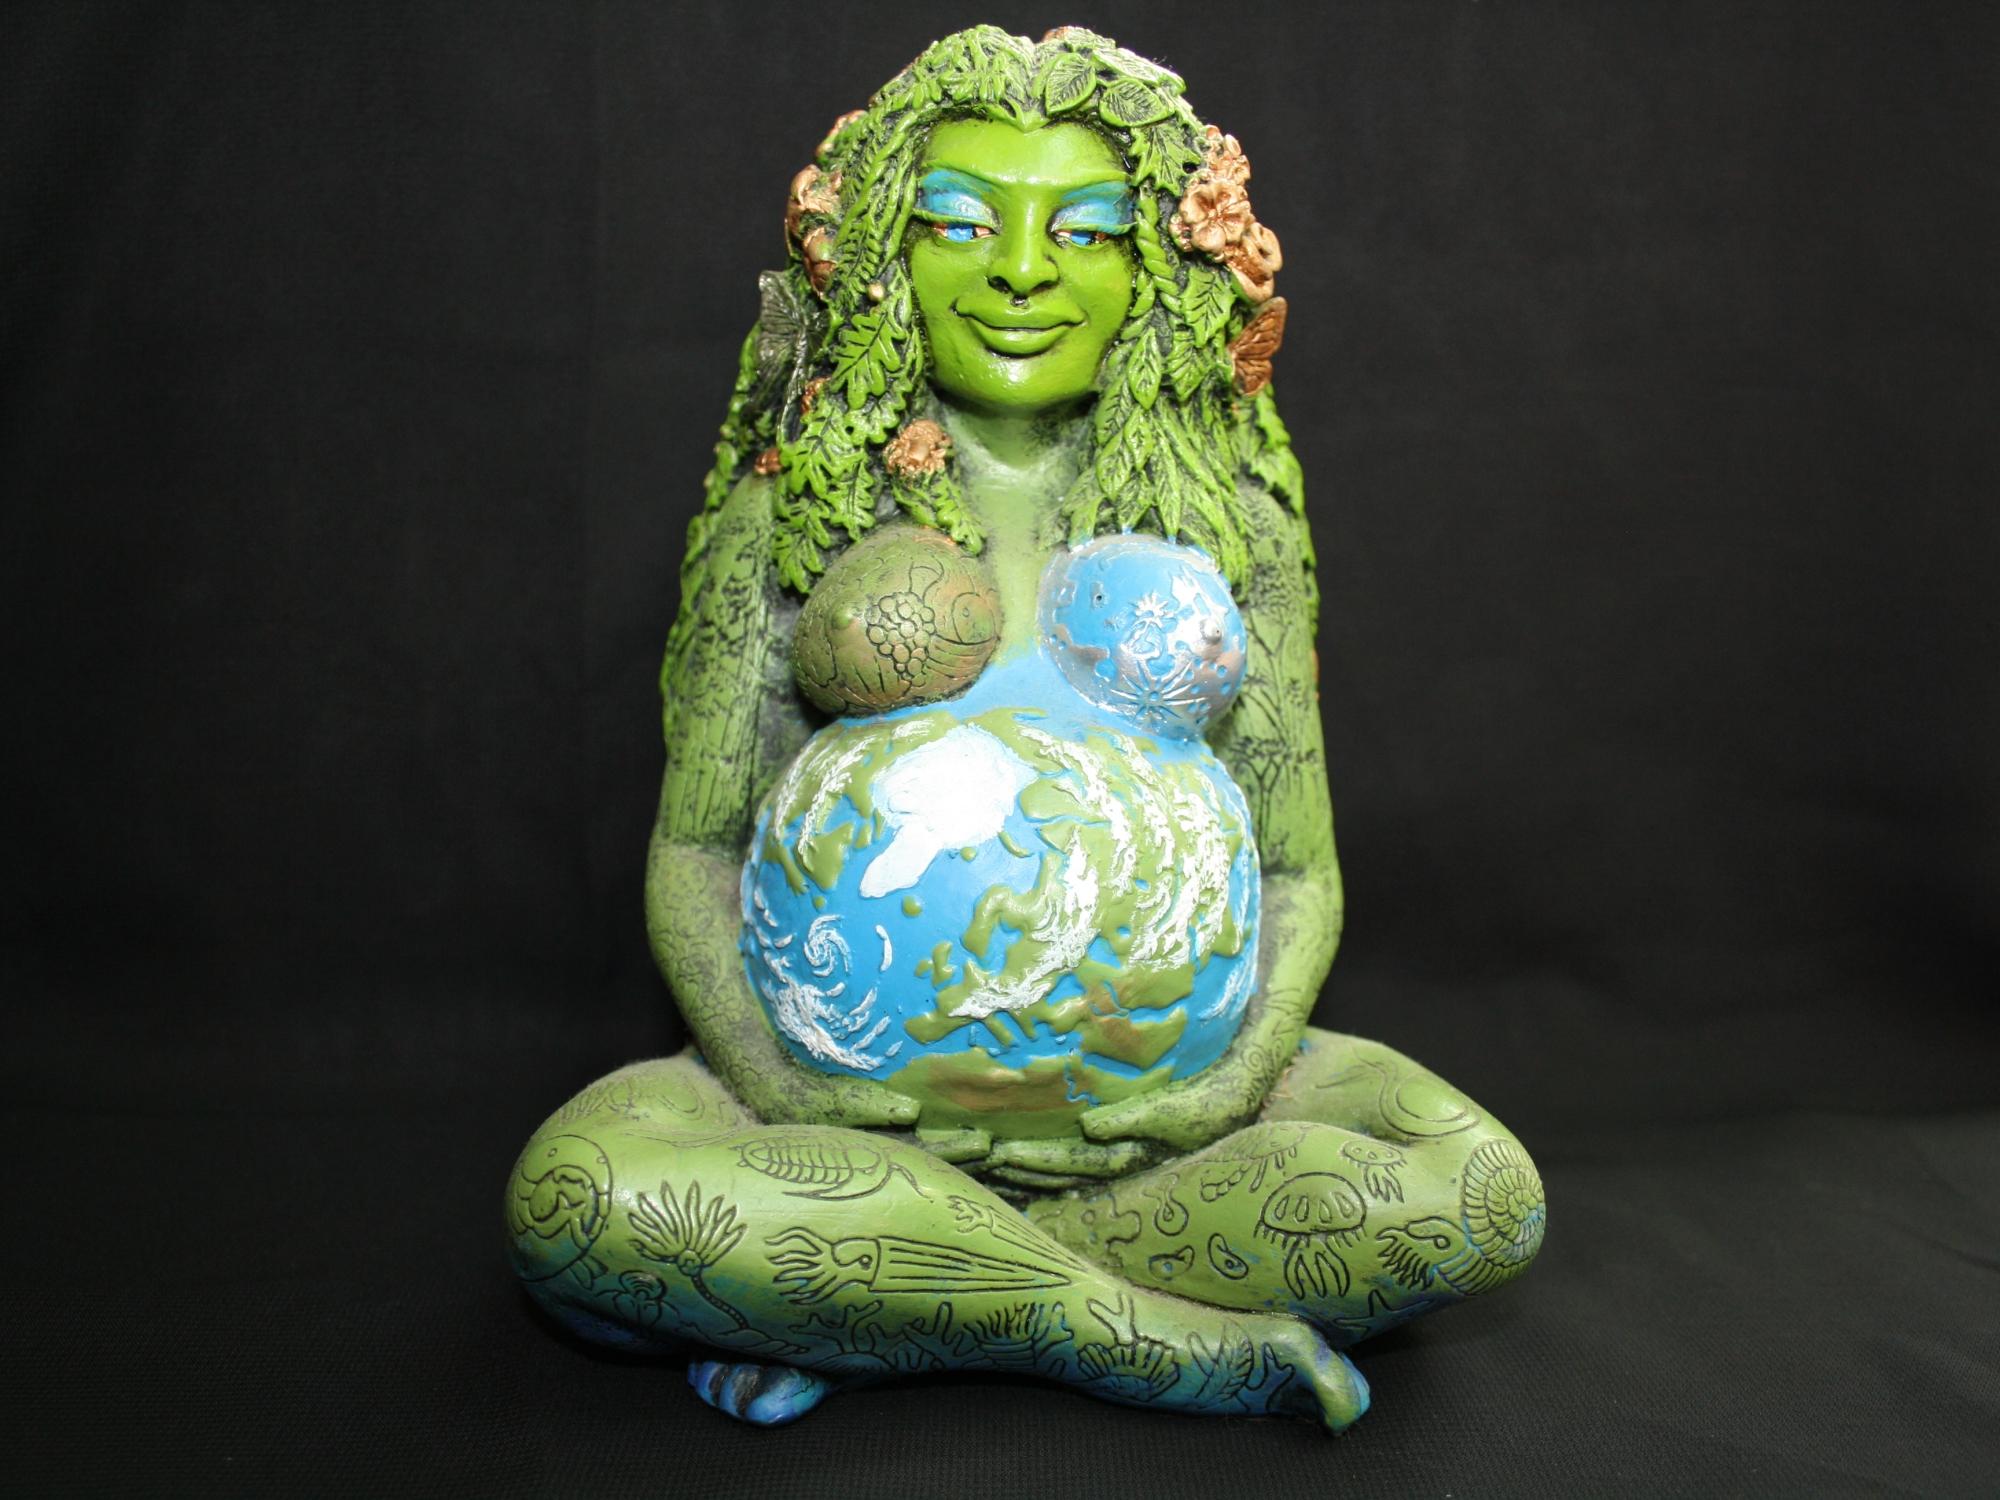 Ancient Gaia Statue millennial gaia statue craftedoberon zell